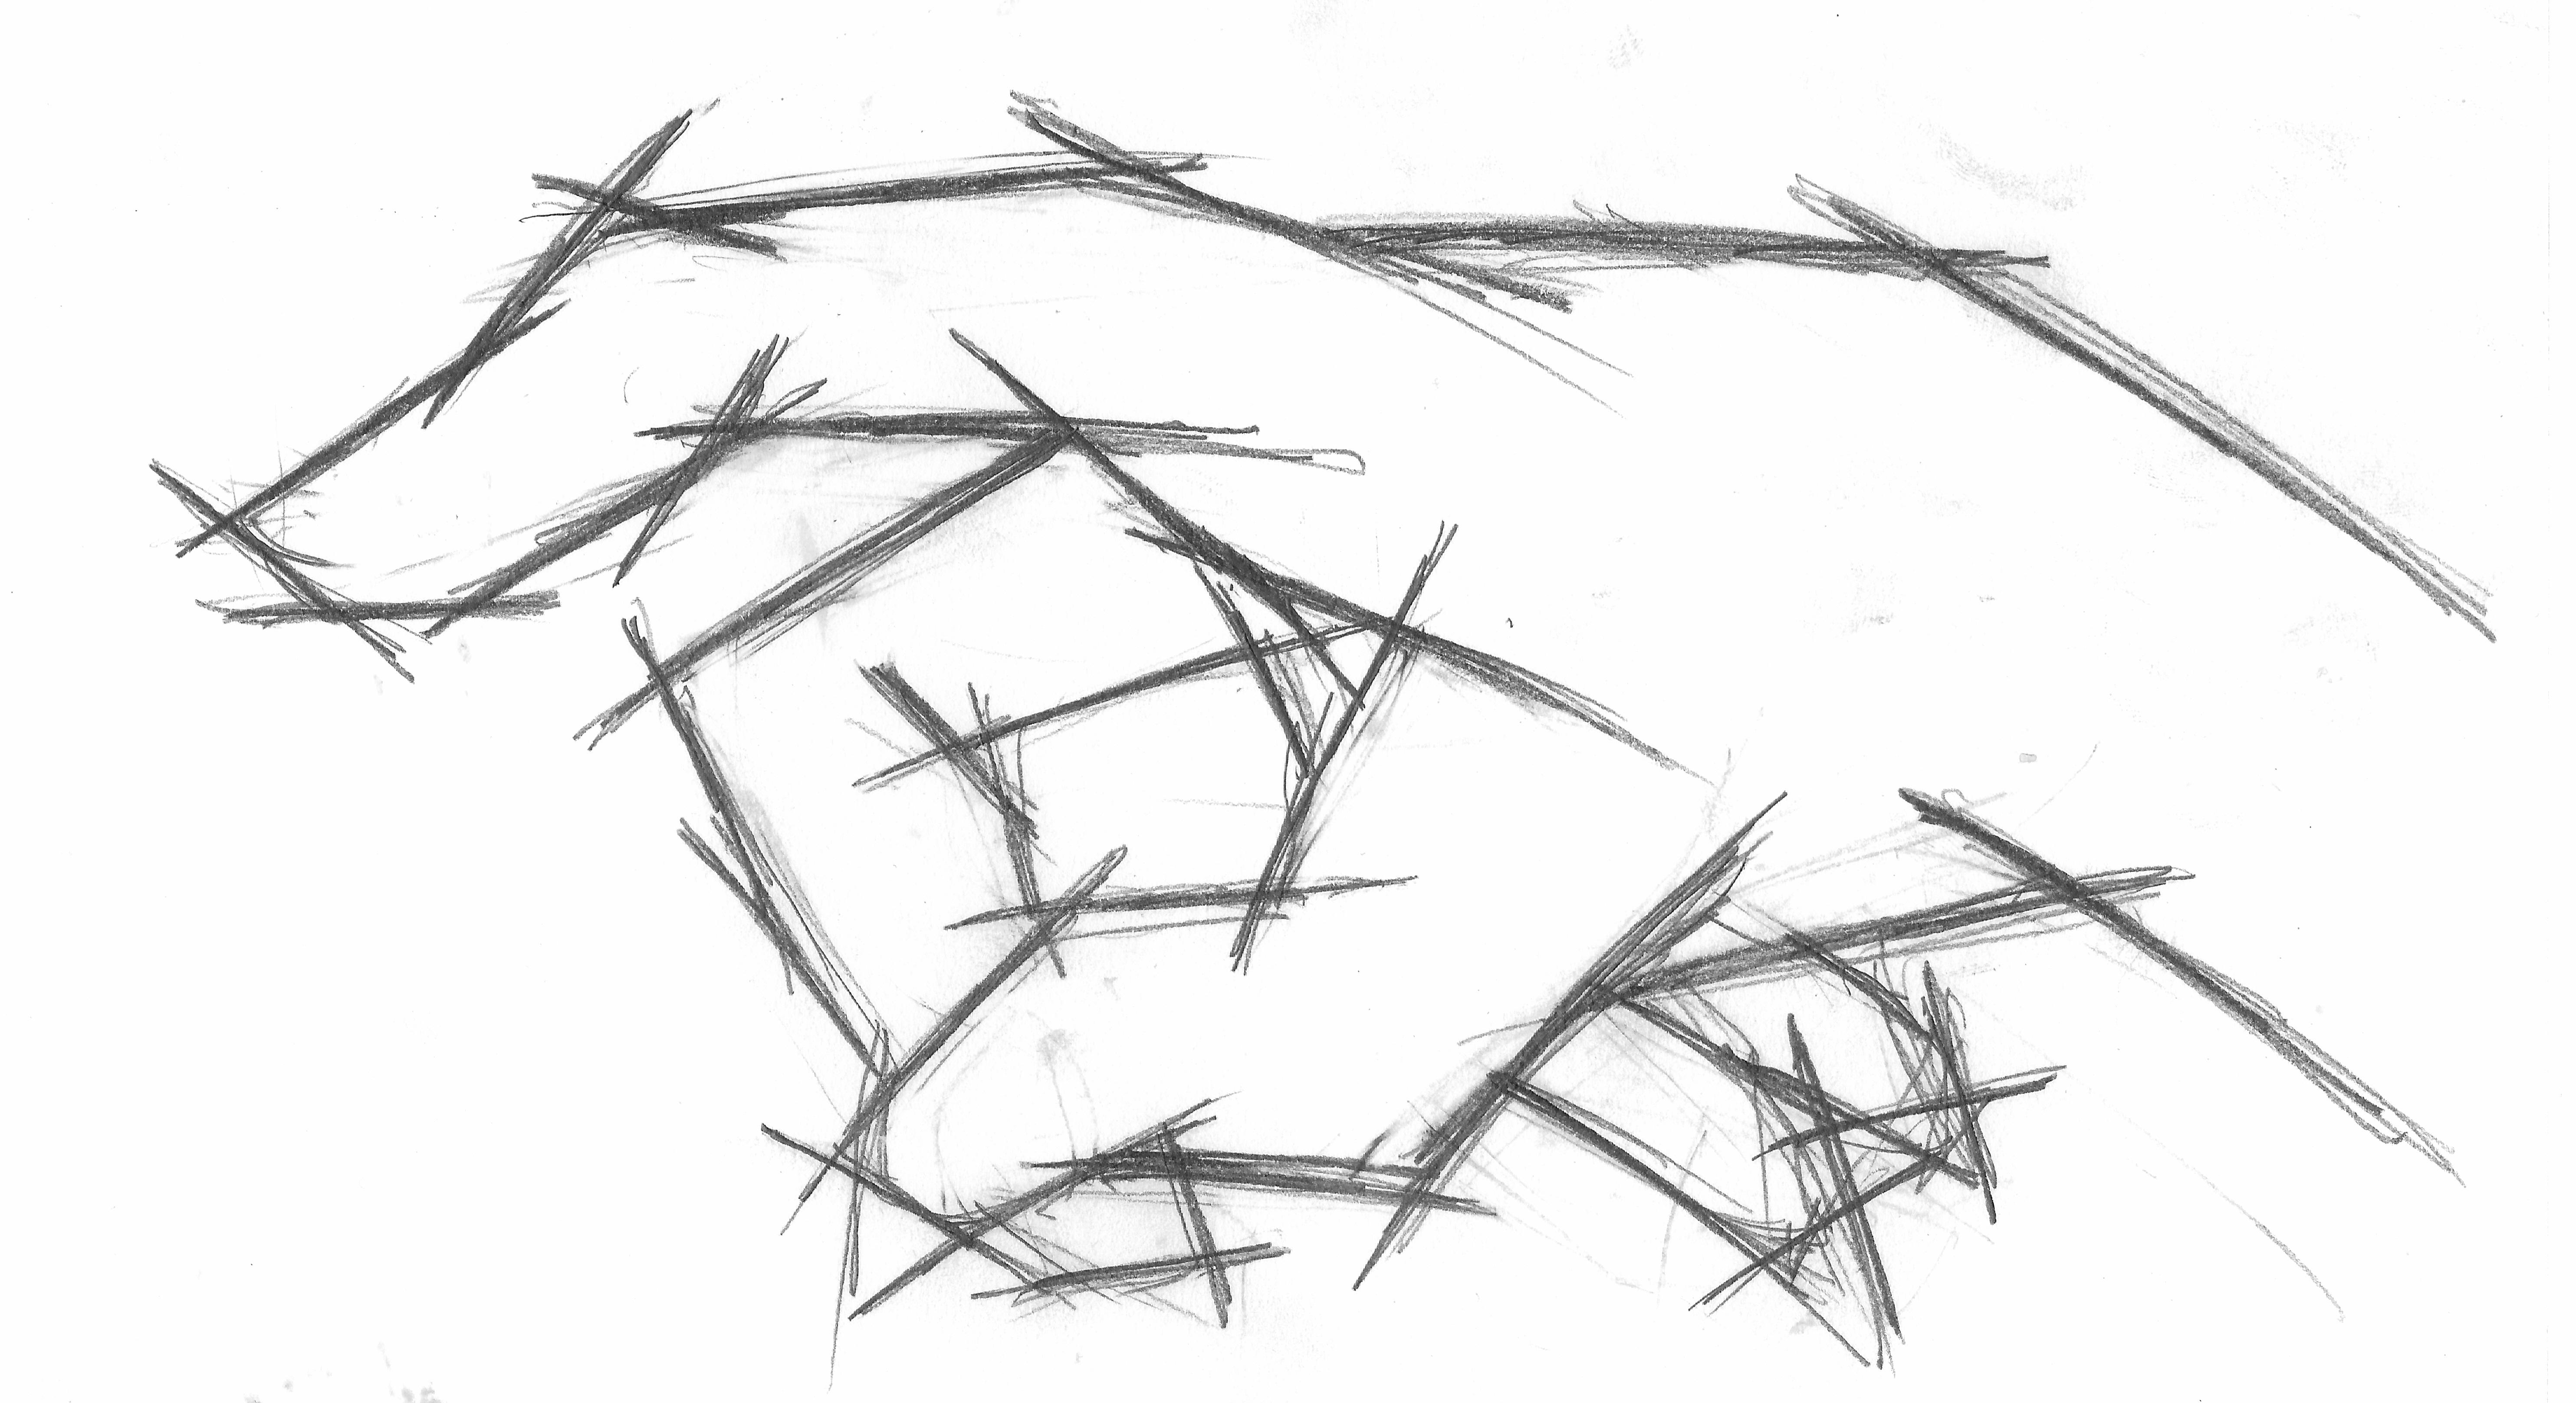 Line Drawing Net : Line frame hand sketch by lyanaling on deviantart